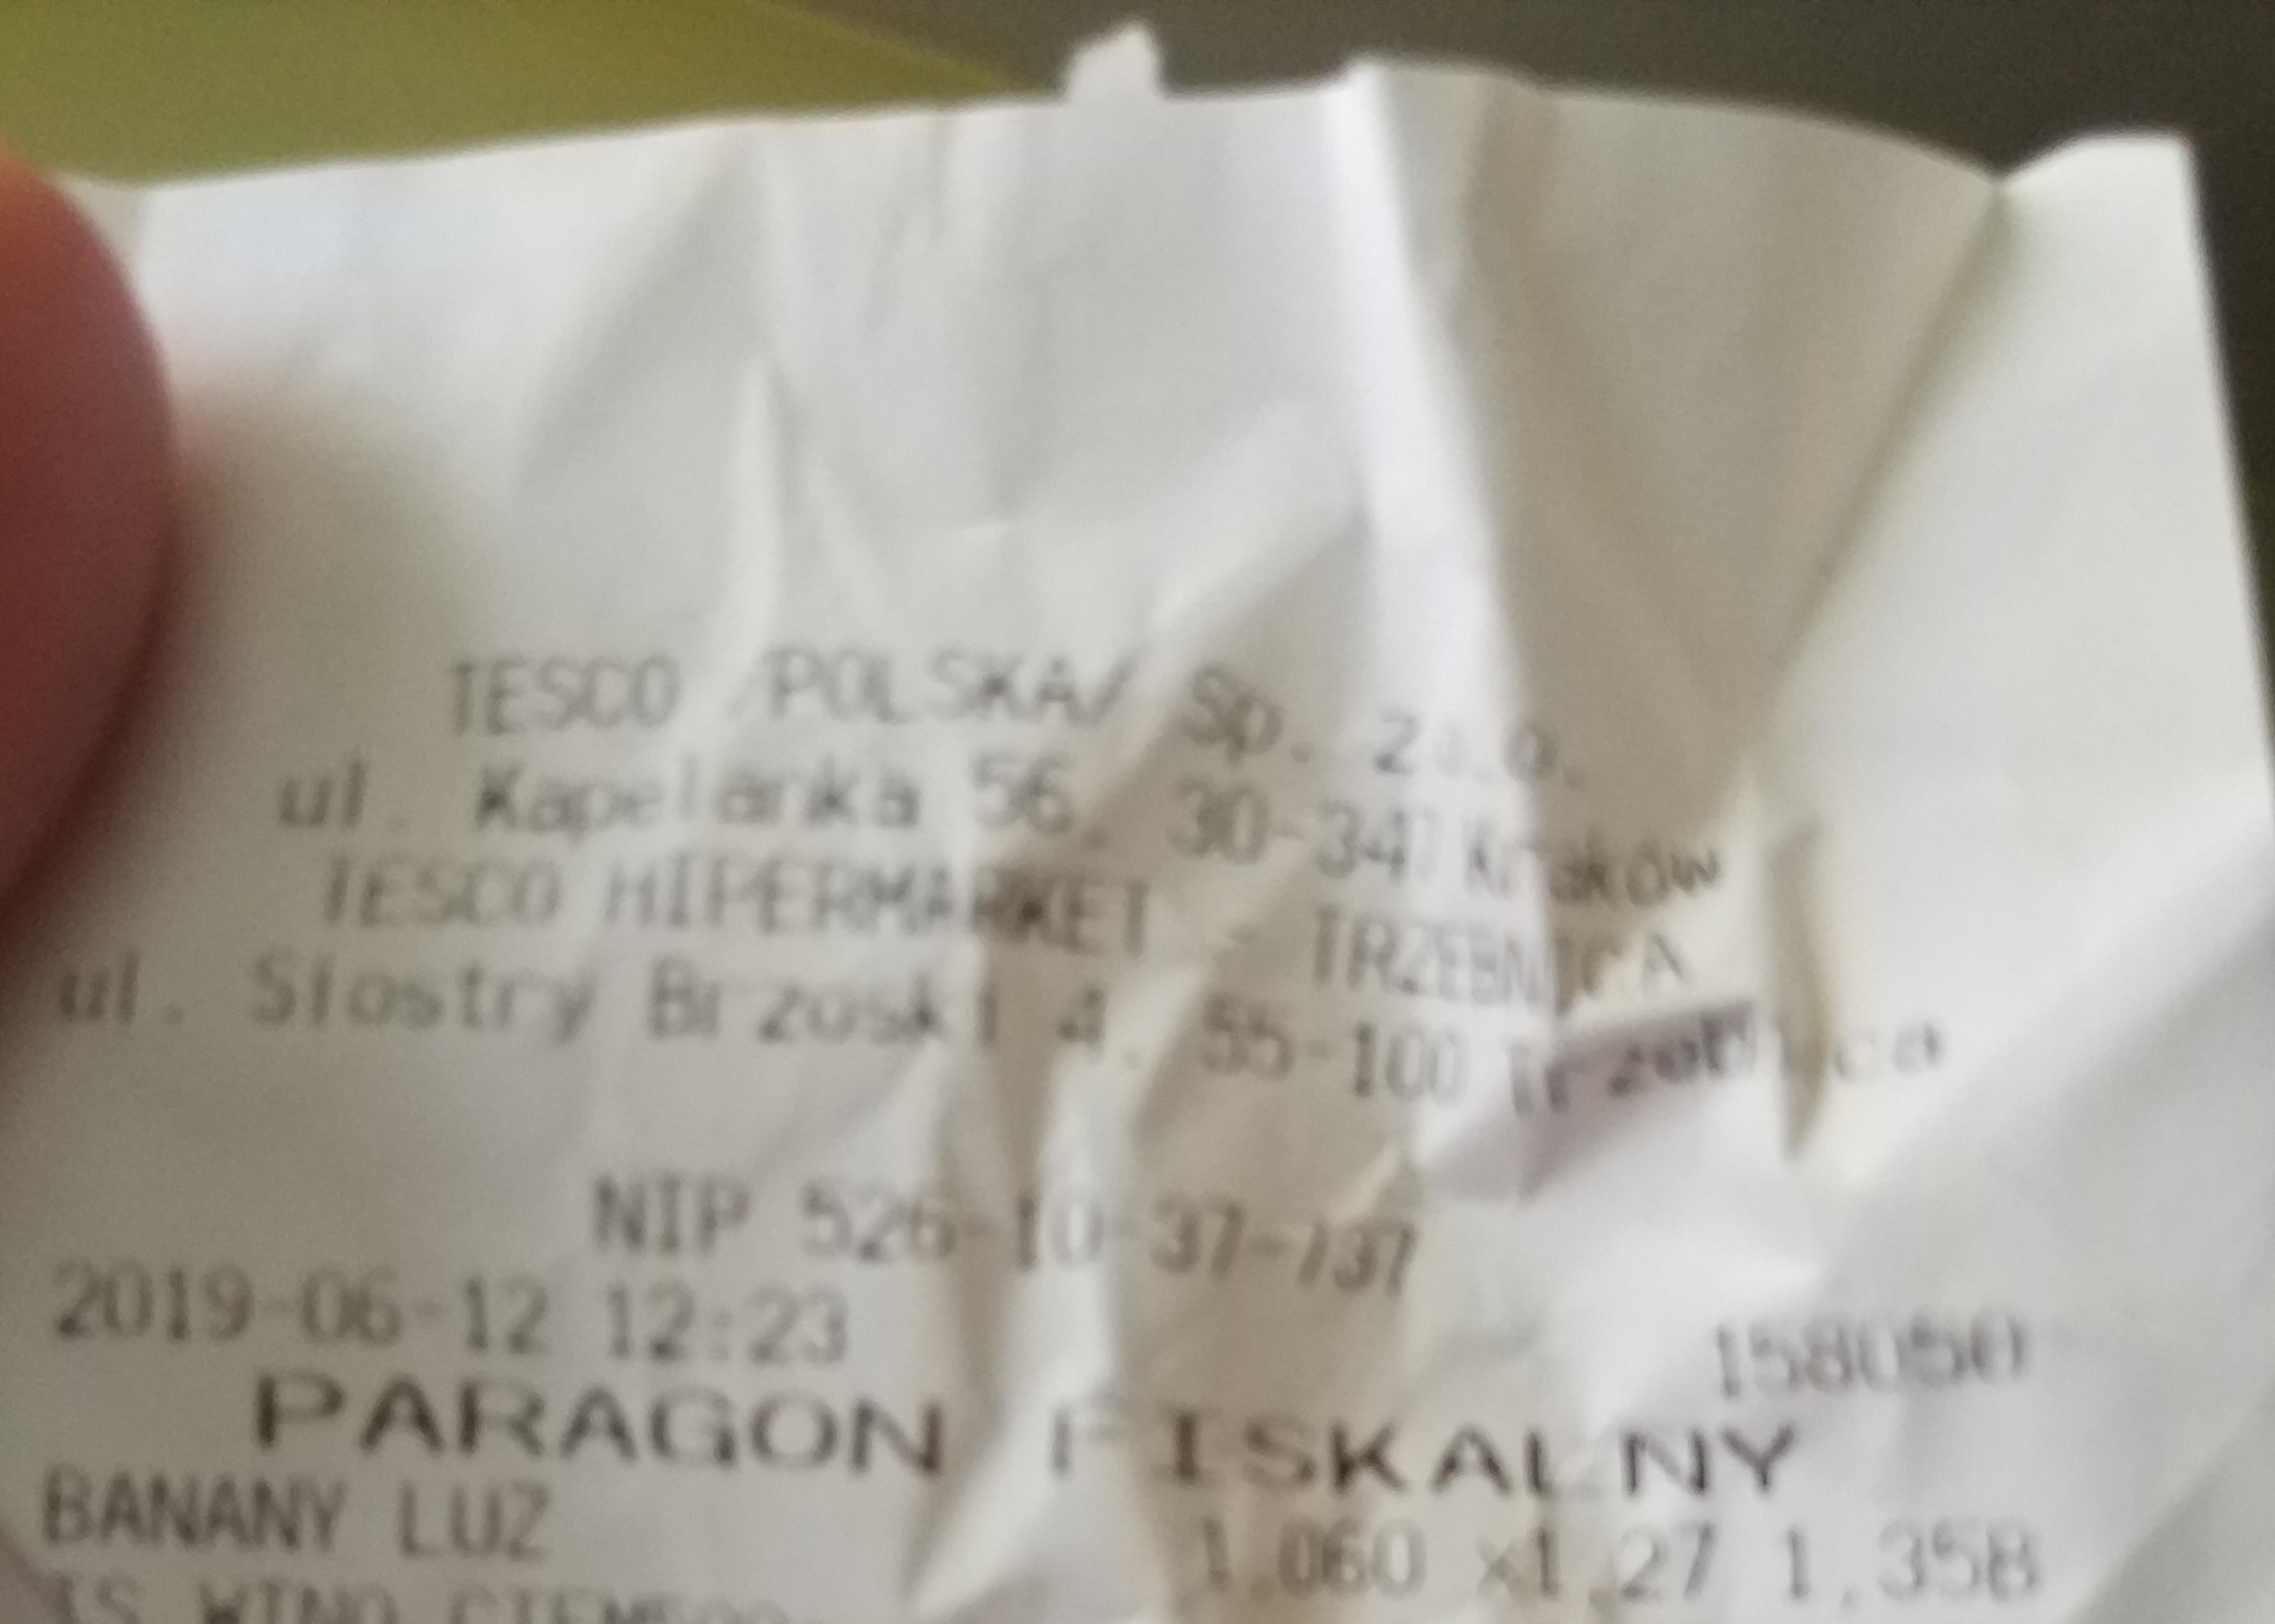 Banany 1,27 zł Tesco / Trzebnica lokalnie ?